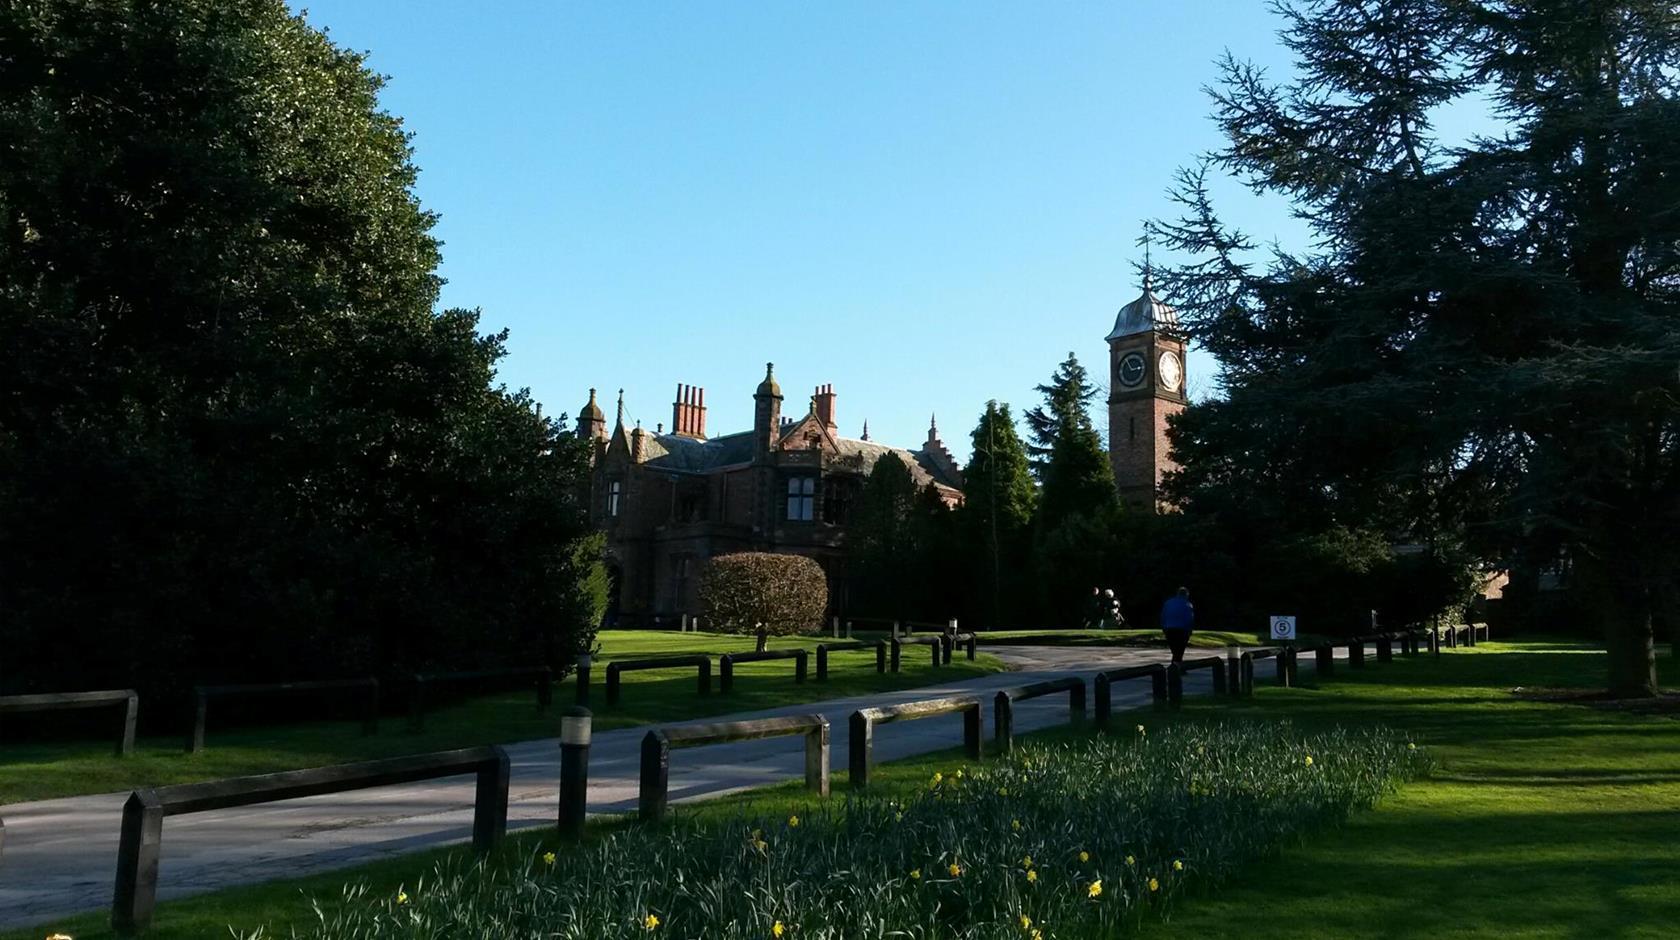 38396-walton-hall-and-gardens-warrington-01